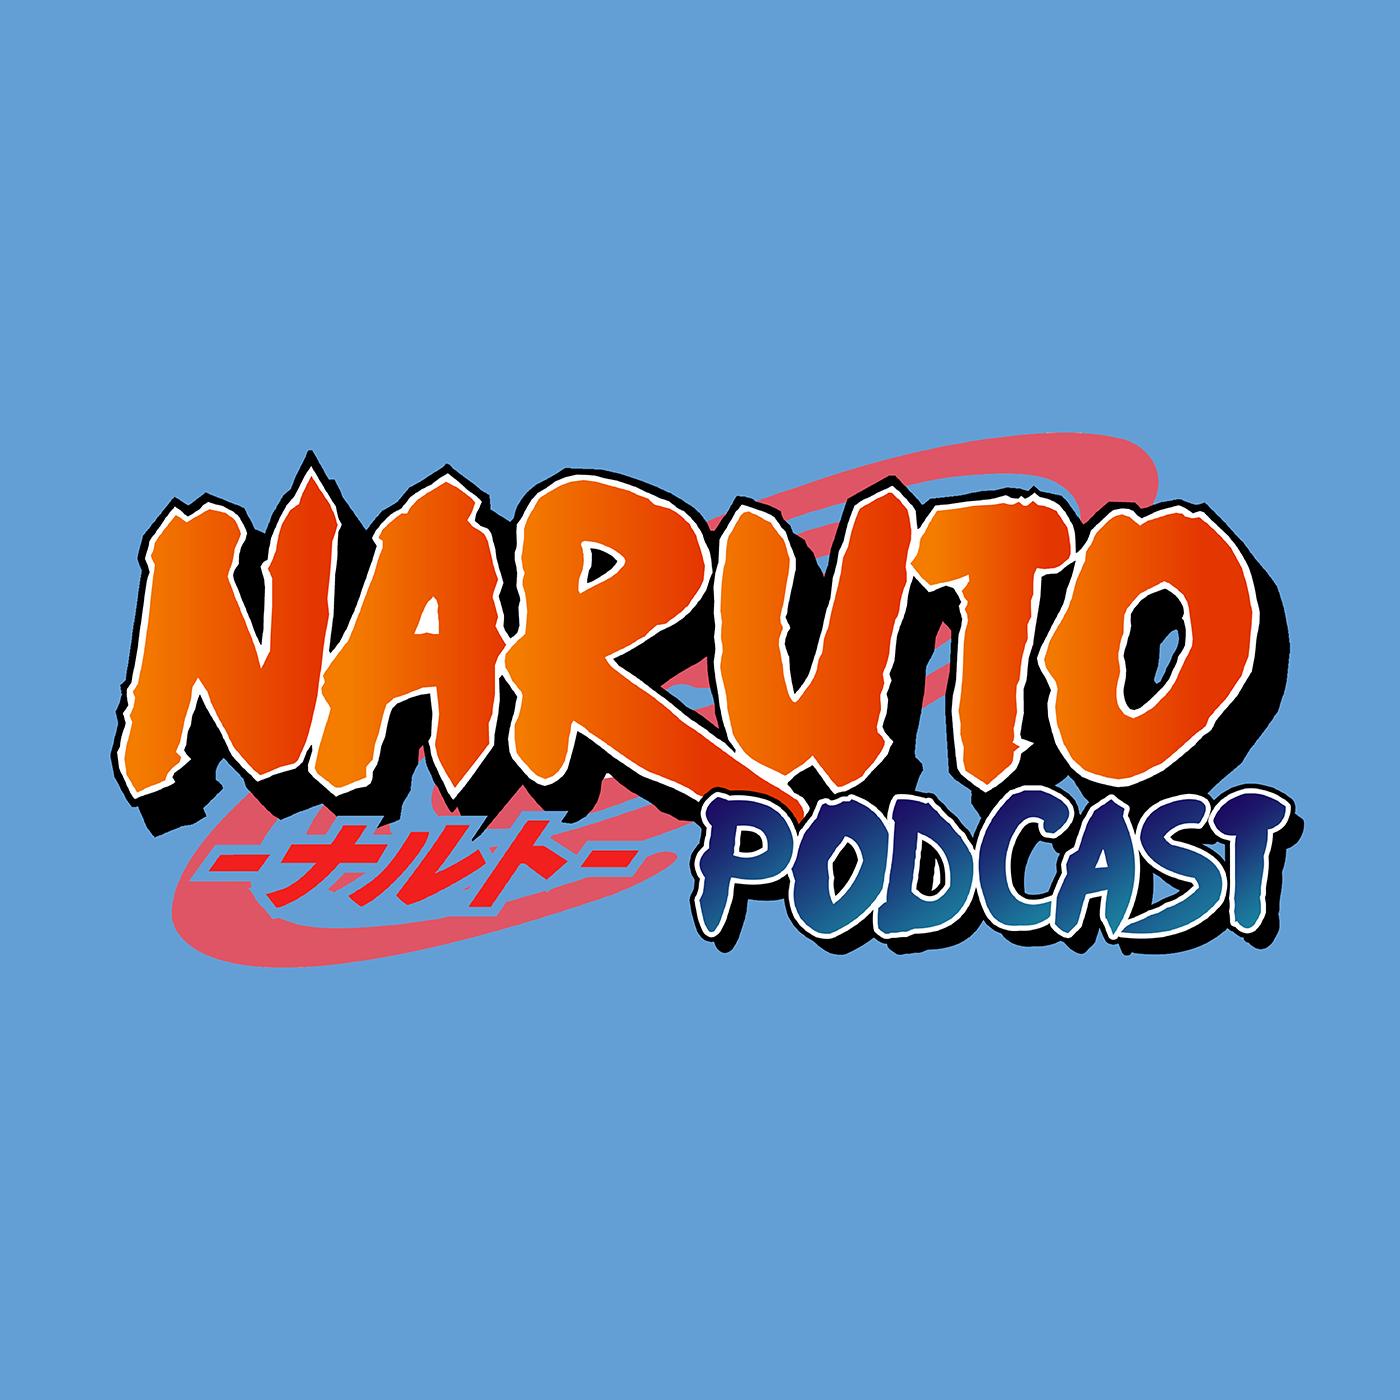 Naruto Podcast